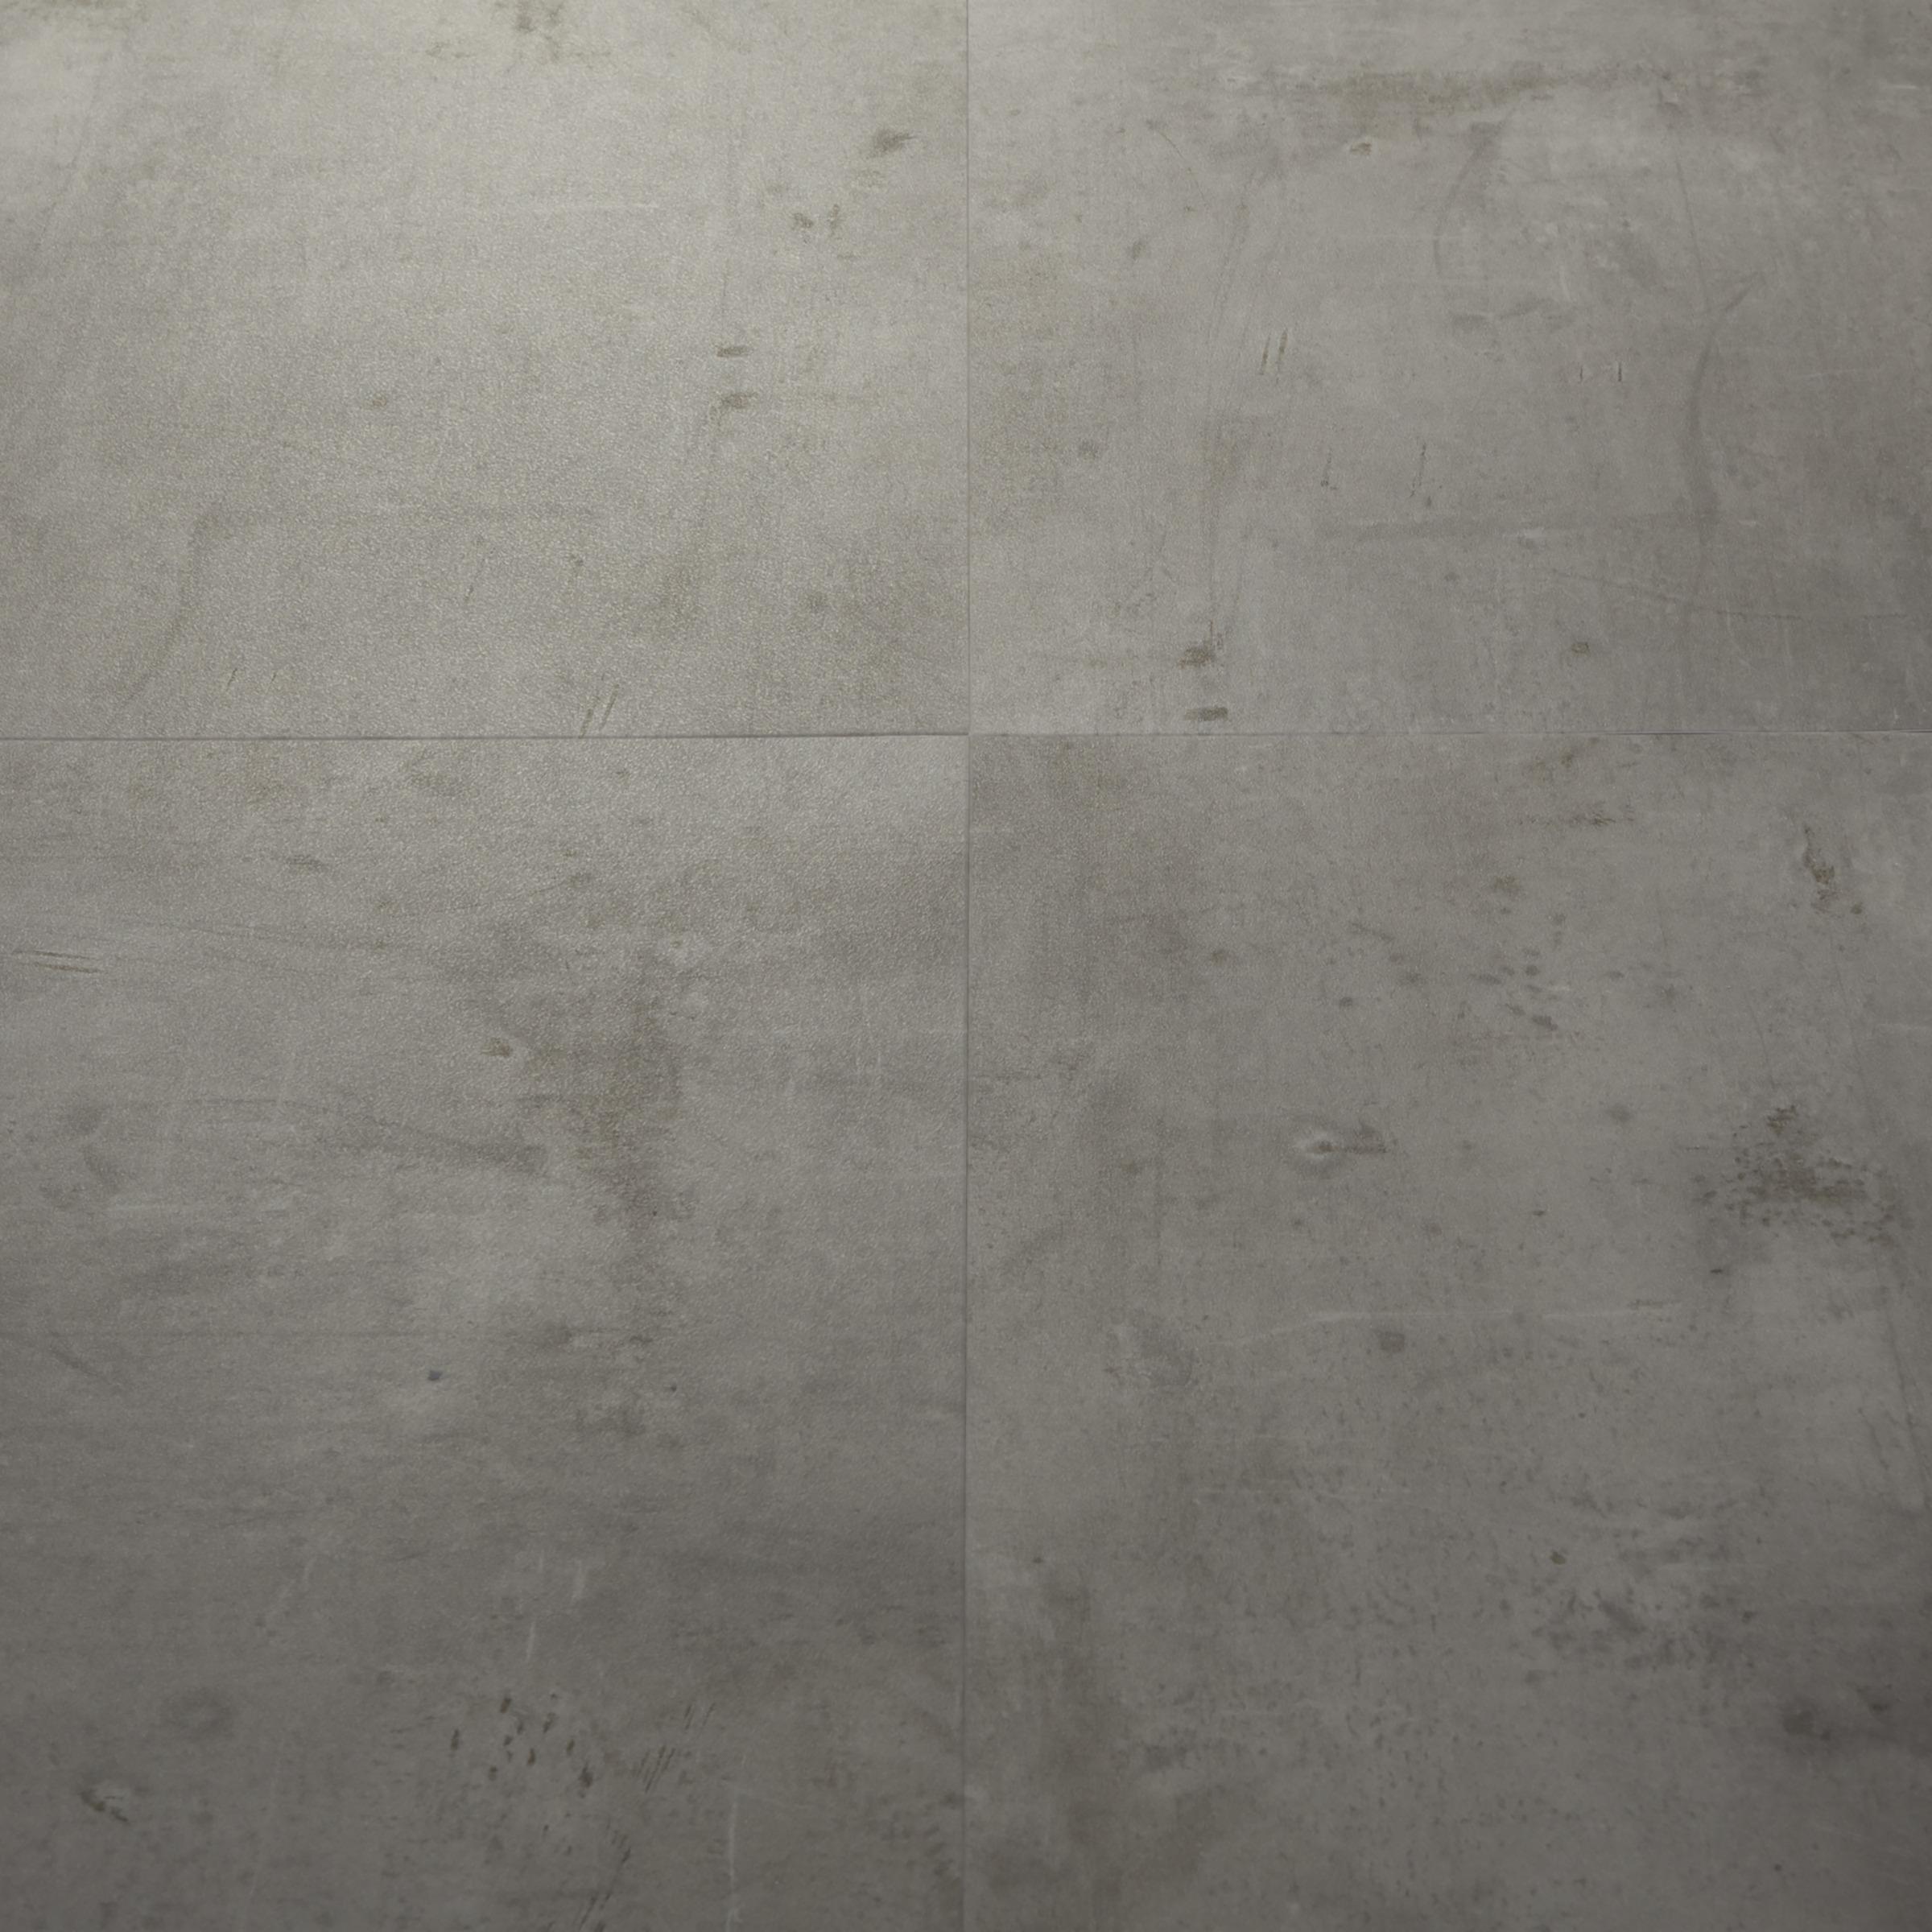 dreamclick pvc betontegel industrieel grijs 61x61cm 2 25m2